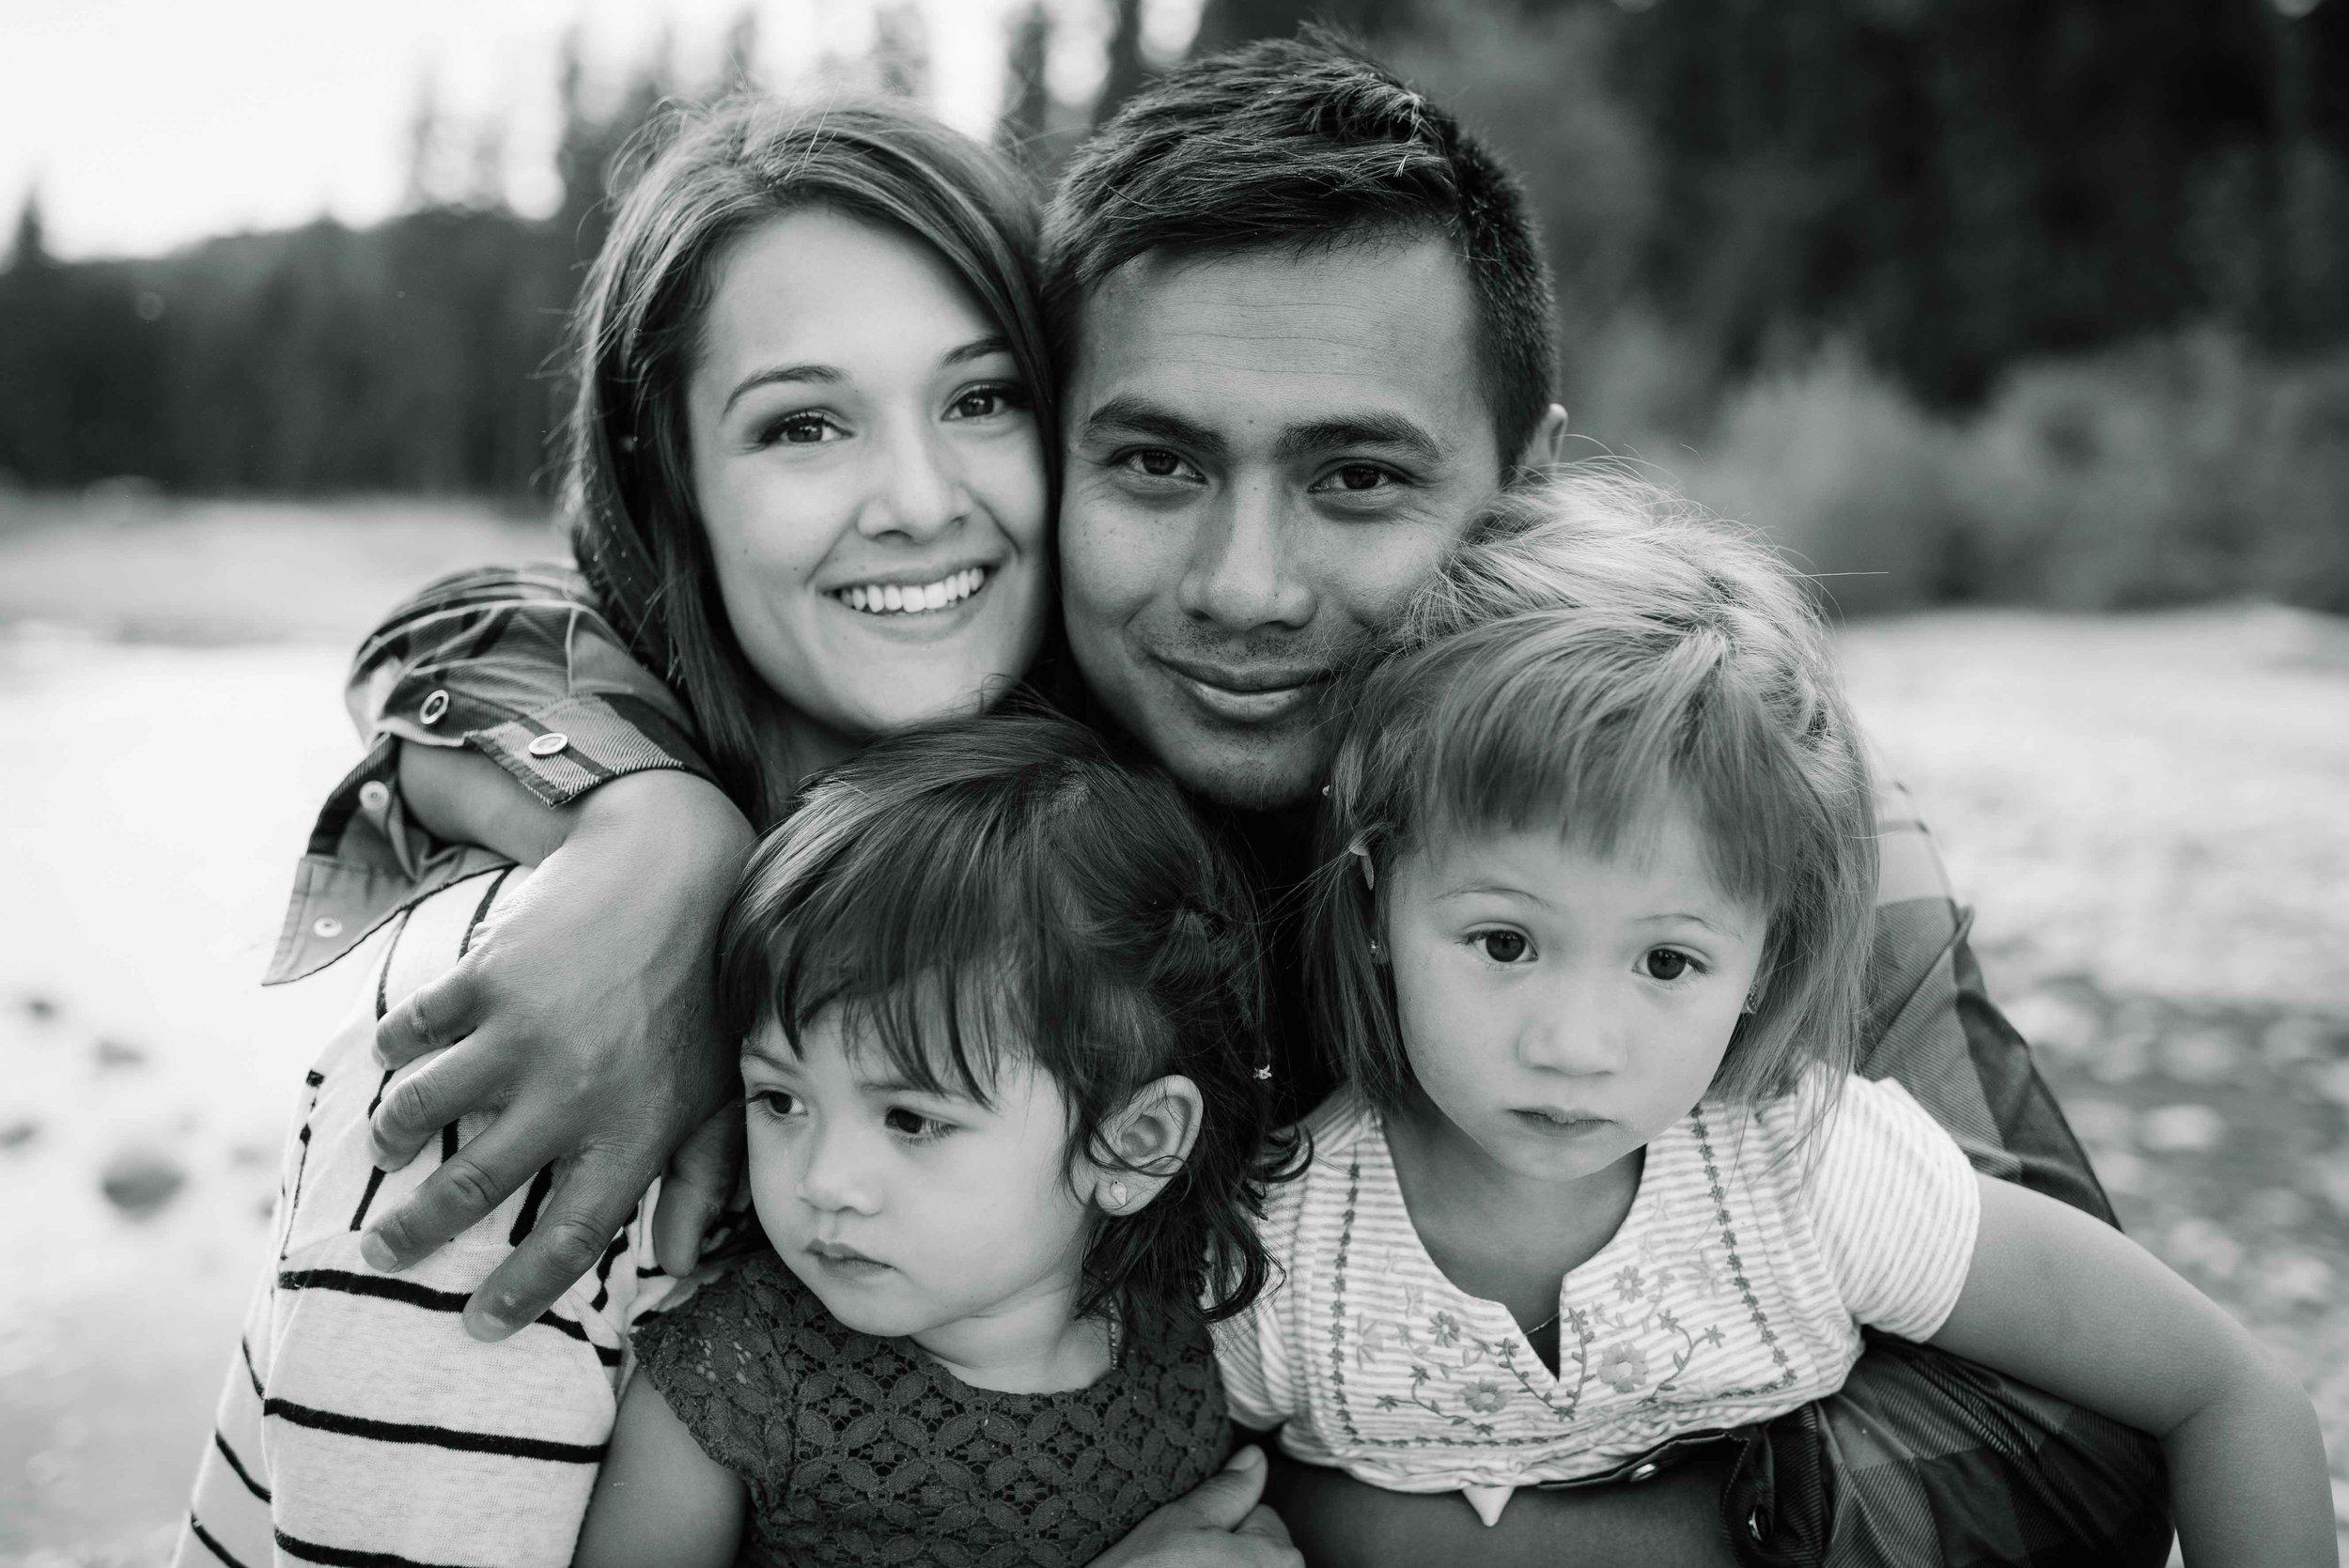 Calgary Canmore Banff Fernie Newborn Family Maternity Photography-109.jpg